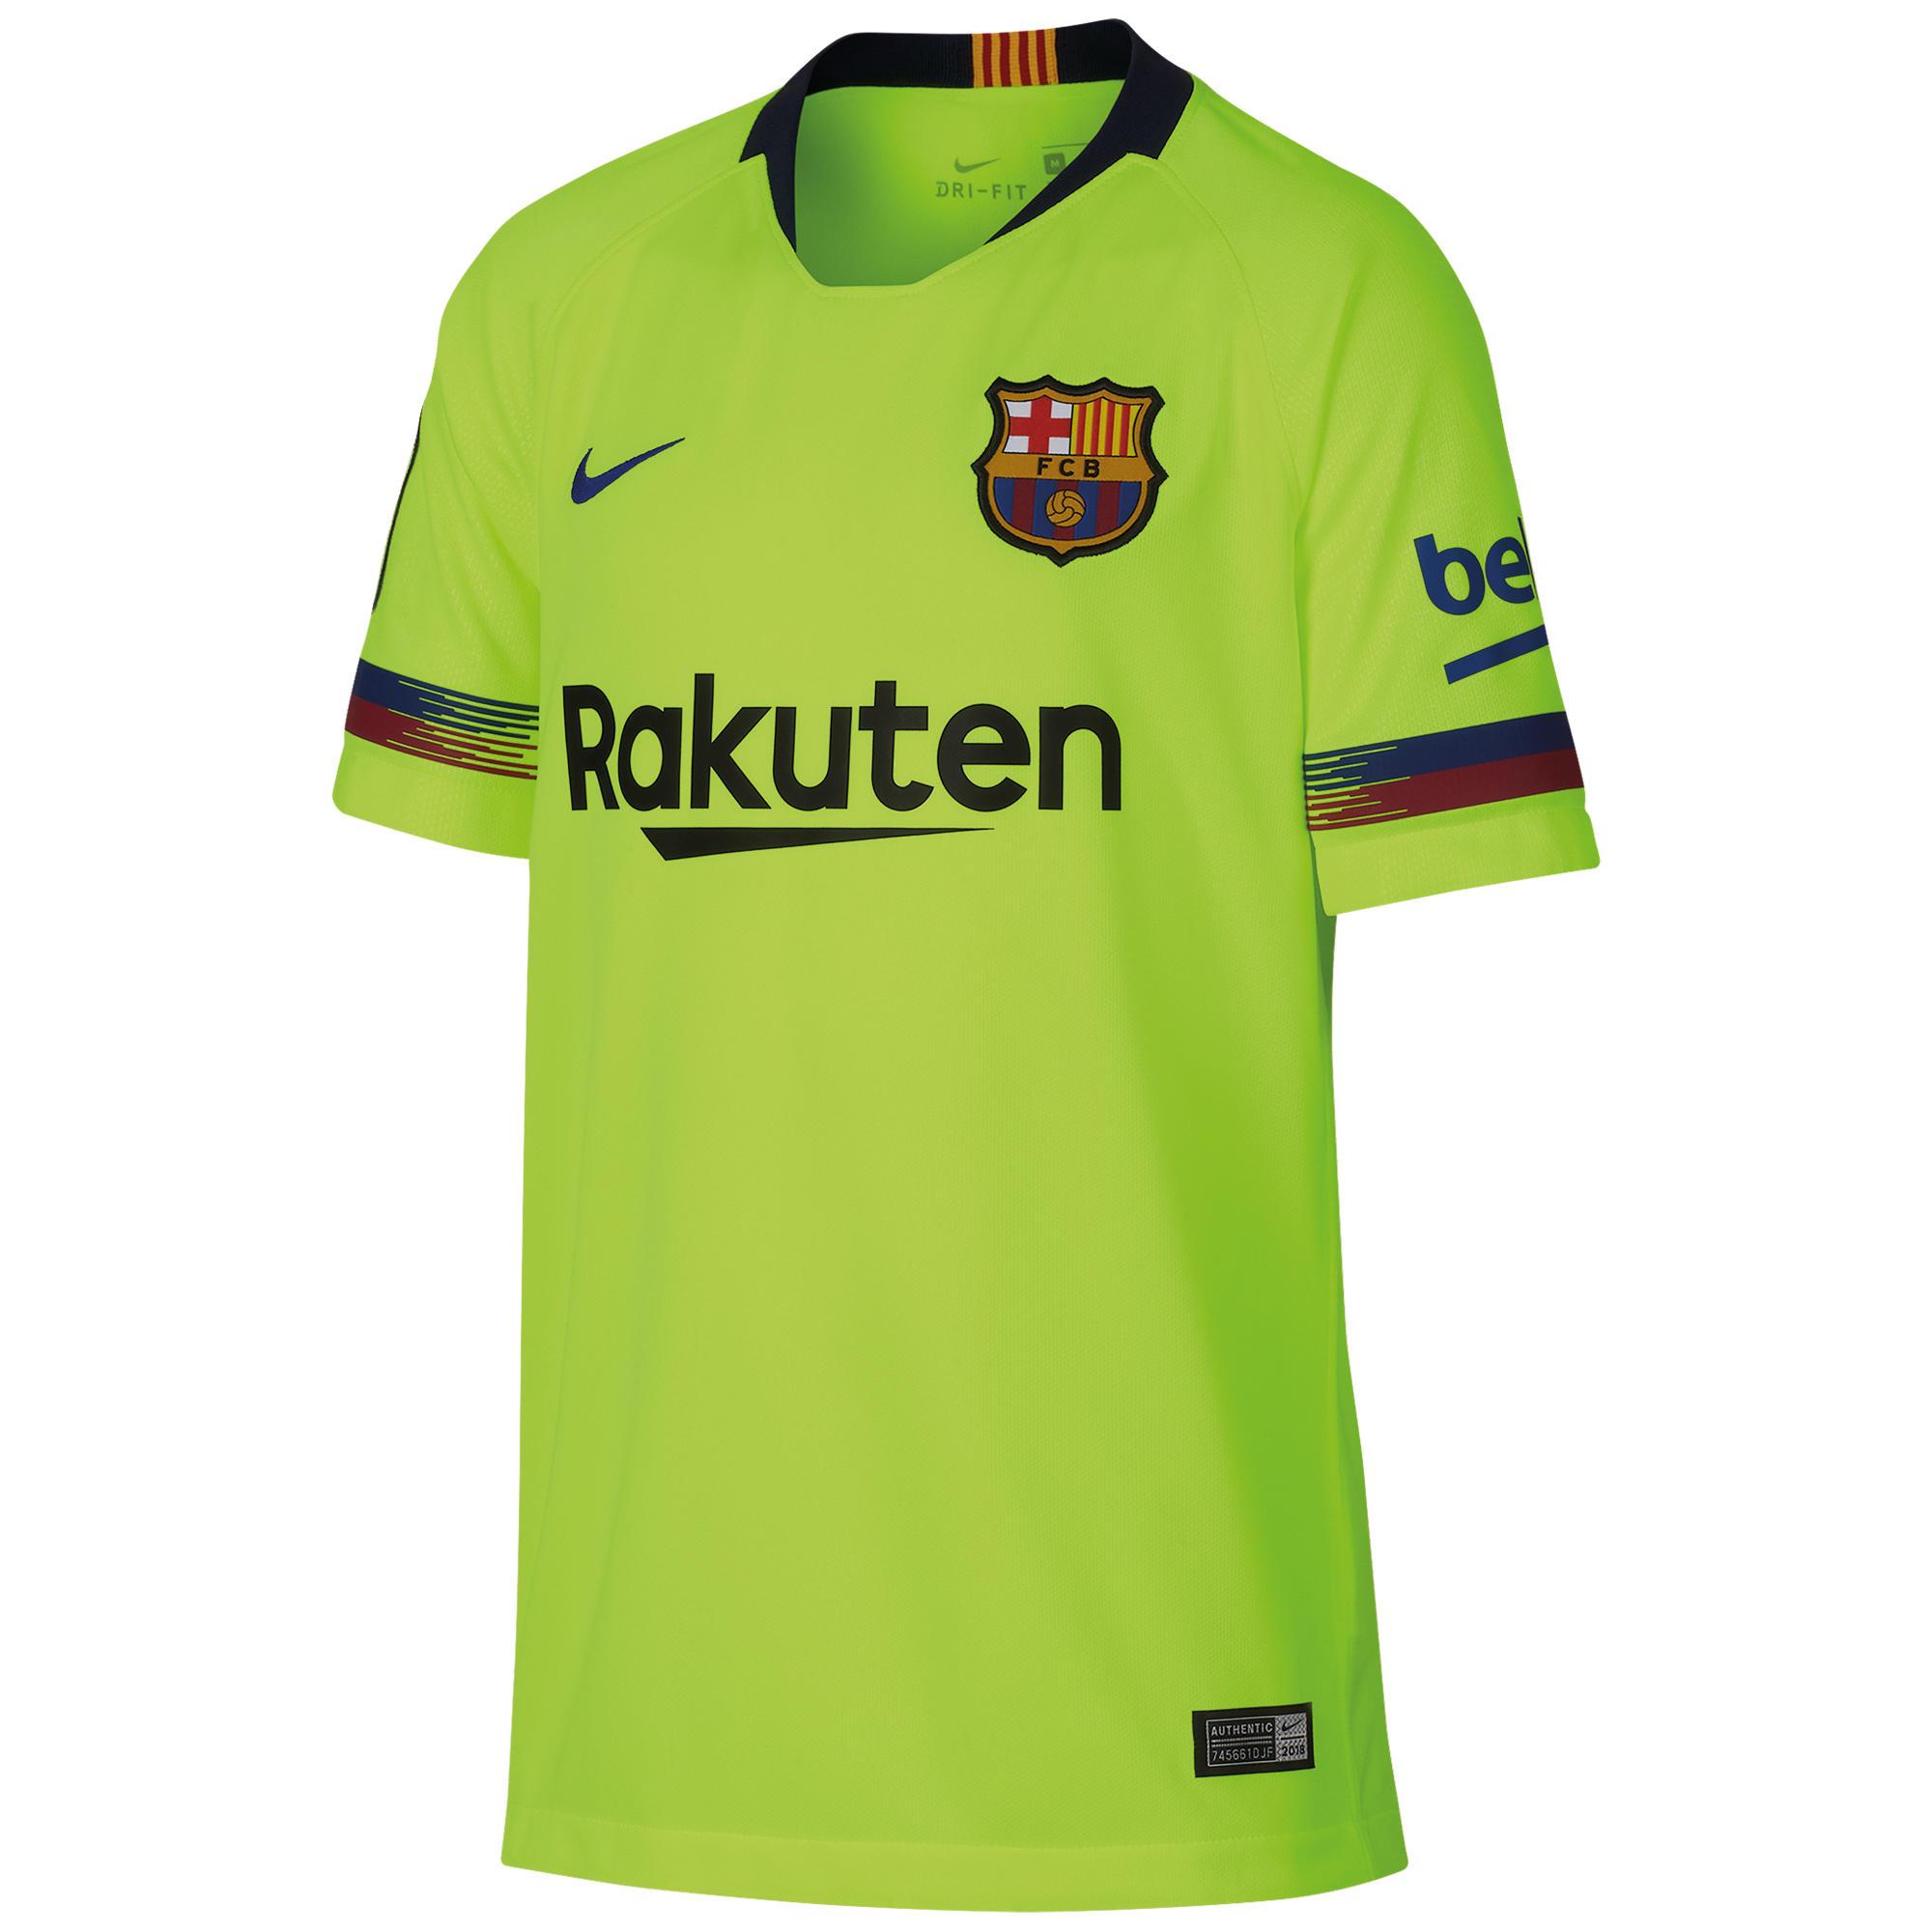 Equipación y Camiseta Oficial F.C. Barcelona 18 19  2be0e300ff7